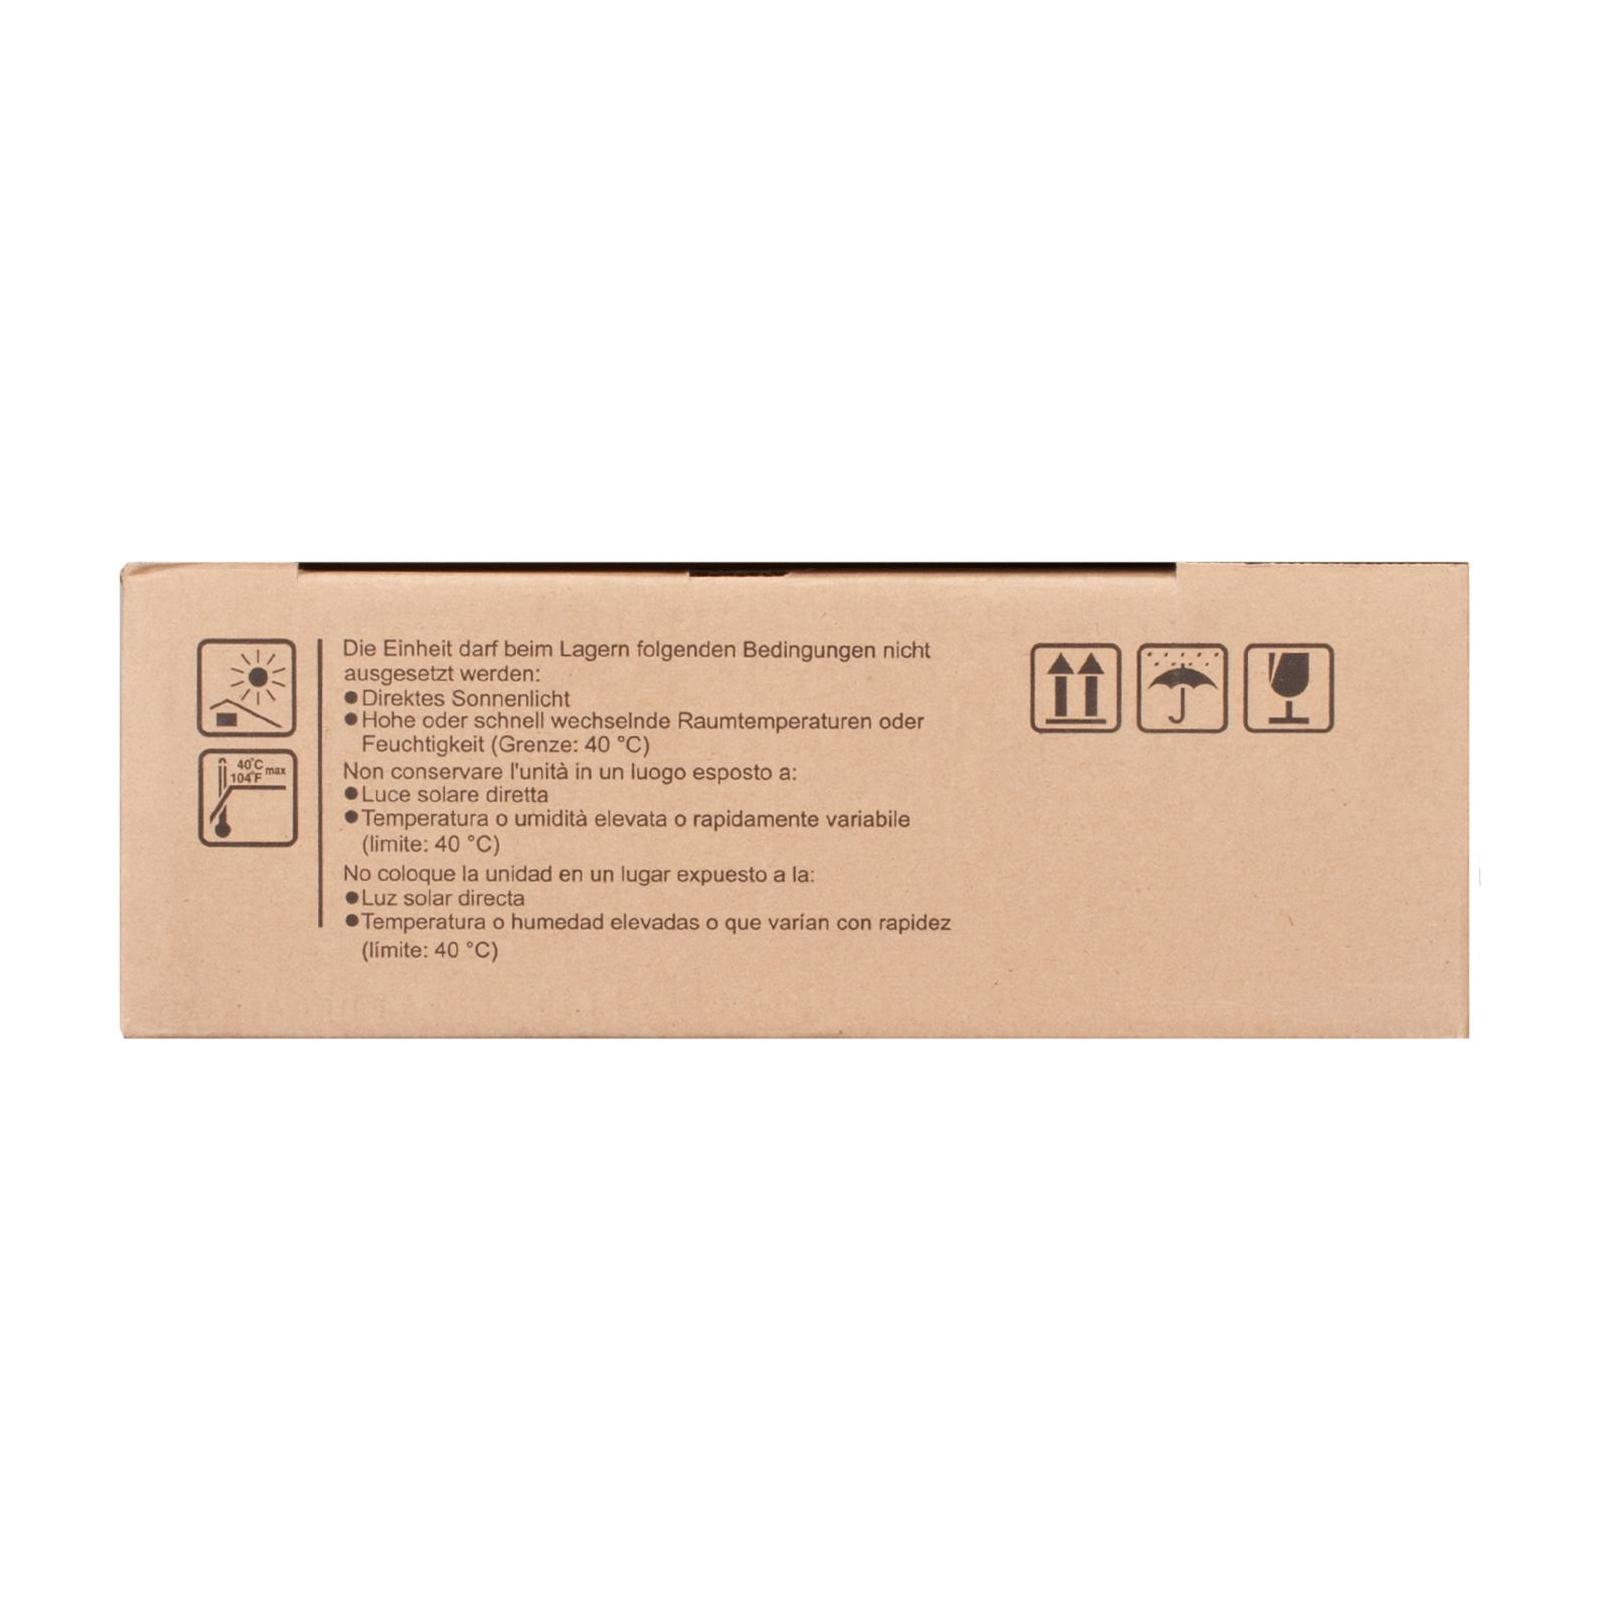 Тонер-картридж Kyocera TK-715 34K (1T02GR0EU0) изображение 4